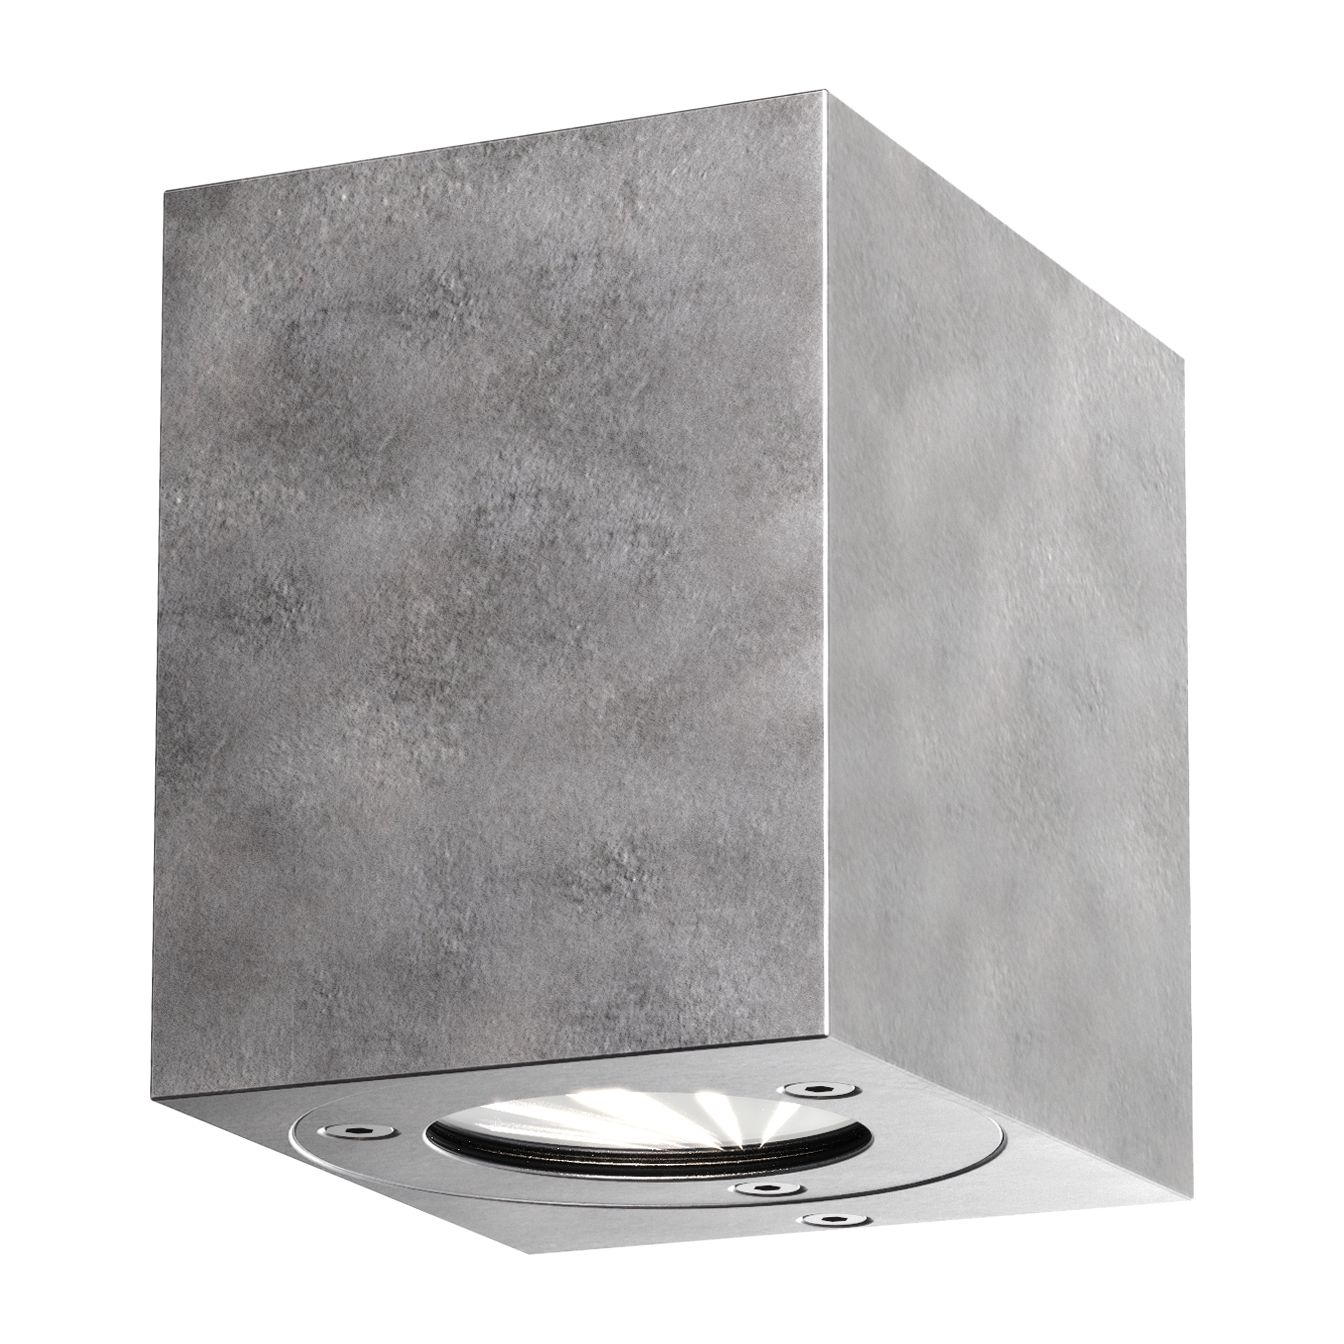 EEK A+, LED-Außenleuchte Kanto - Glas / Stahl - 2-flammig - Platin, Nordlux